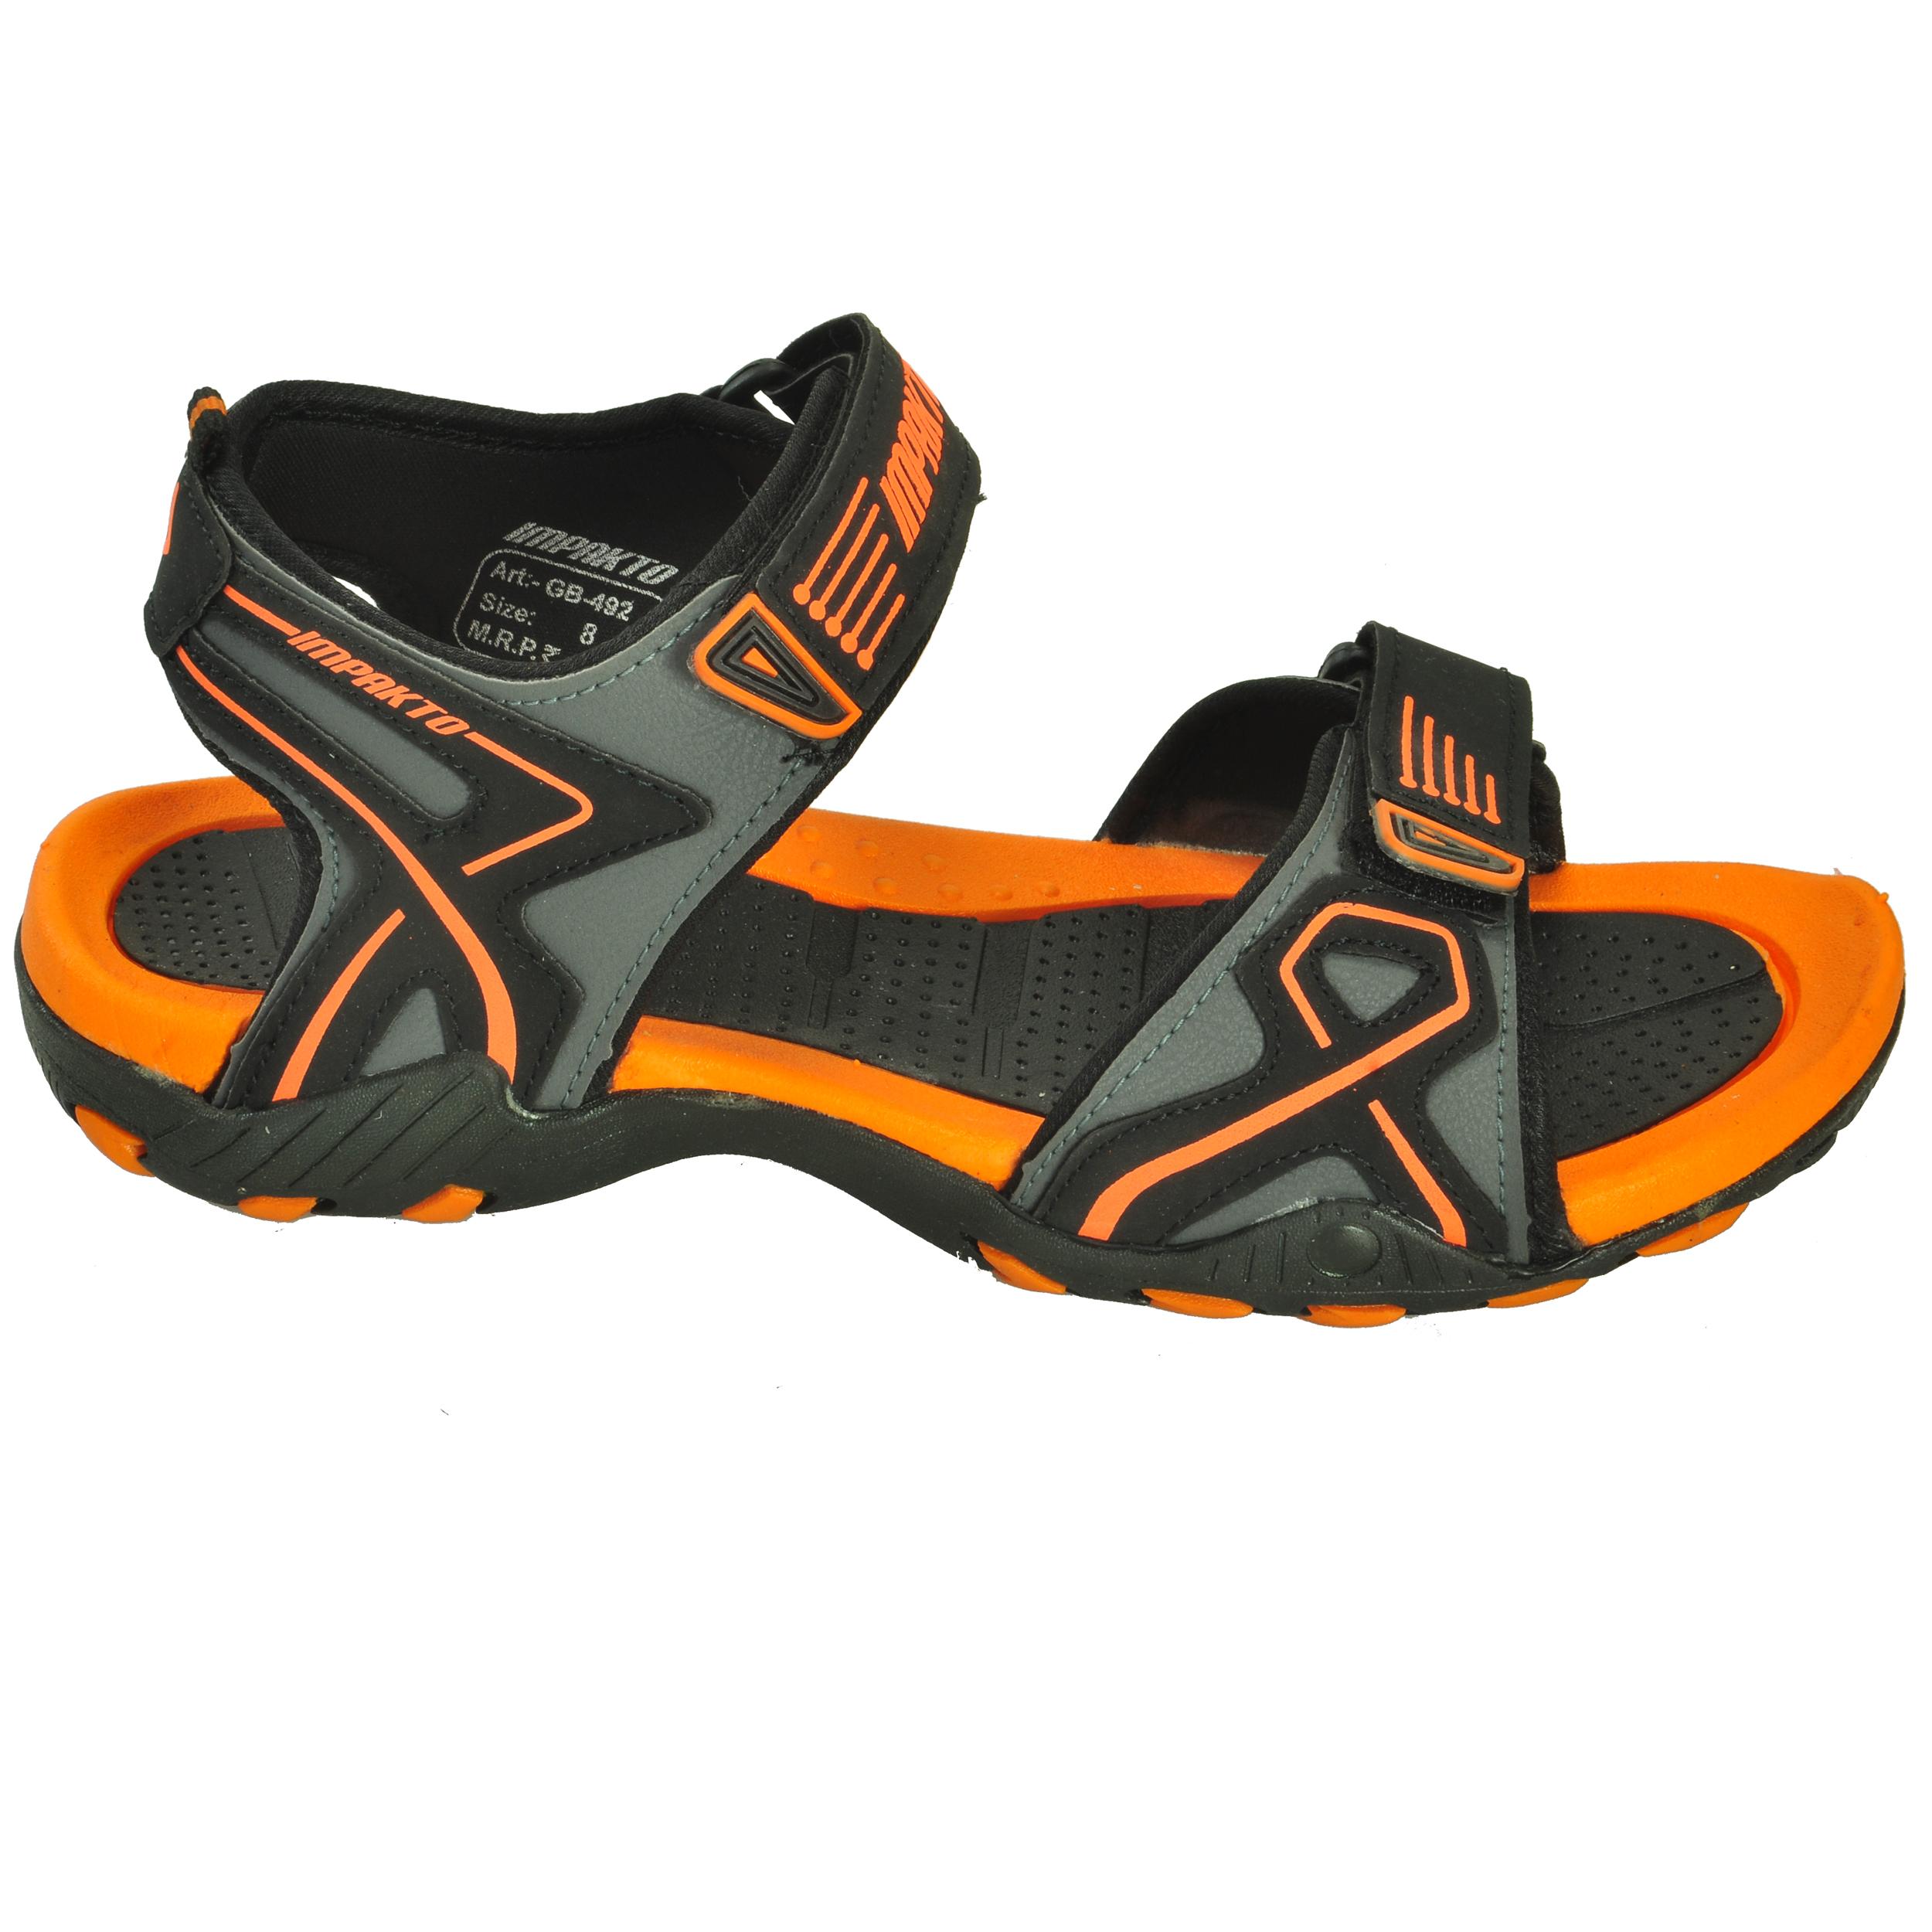 4f25406aa Impakto Men s Classy Sandal Slipper - Orange